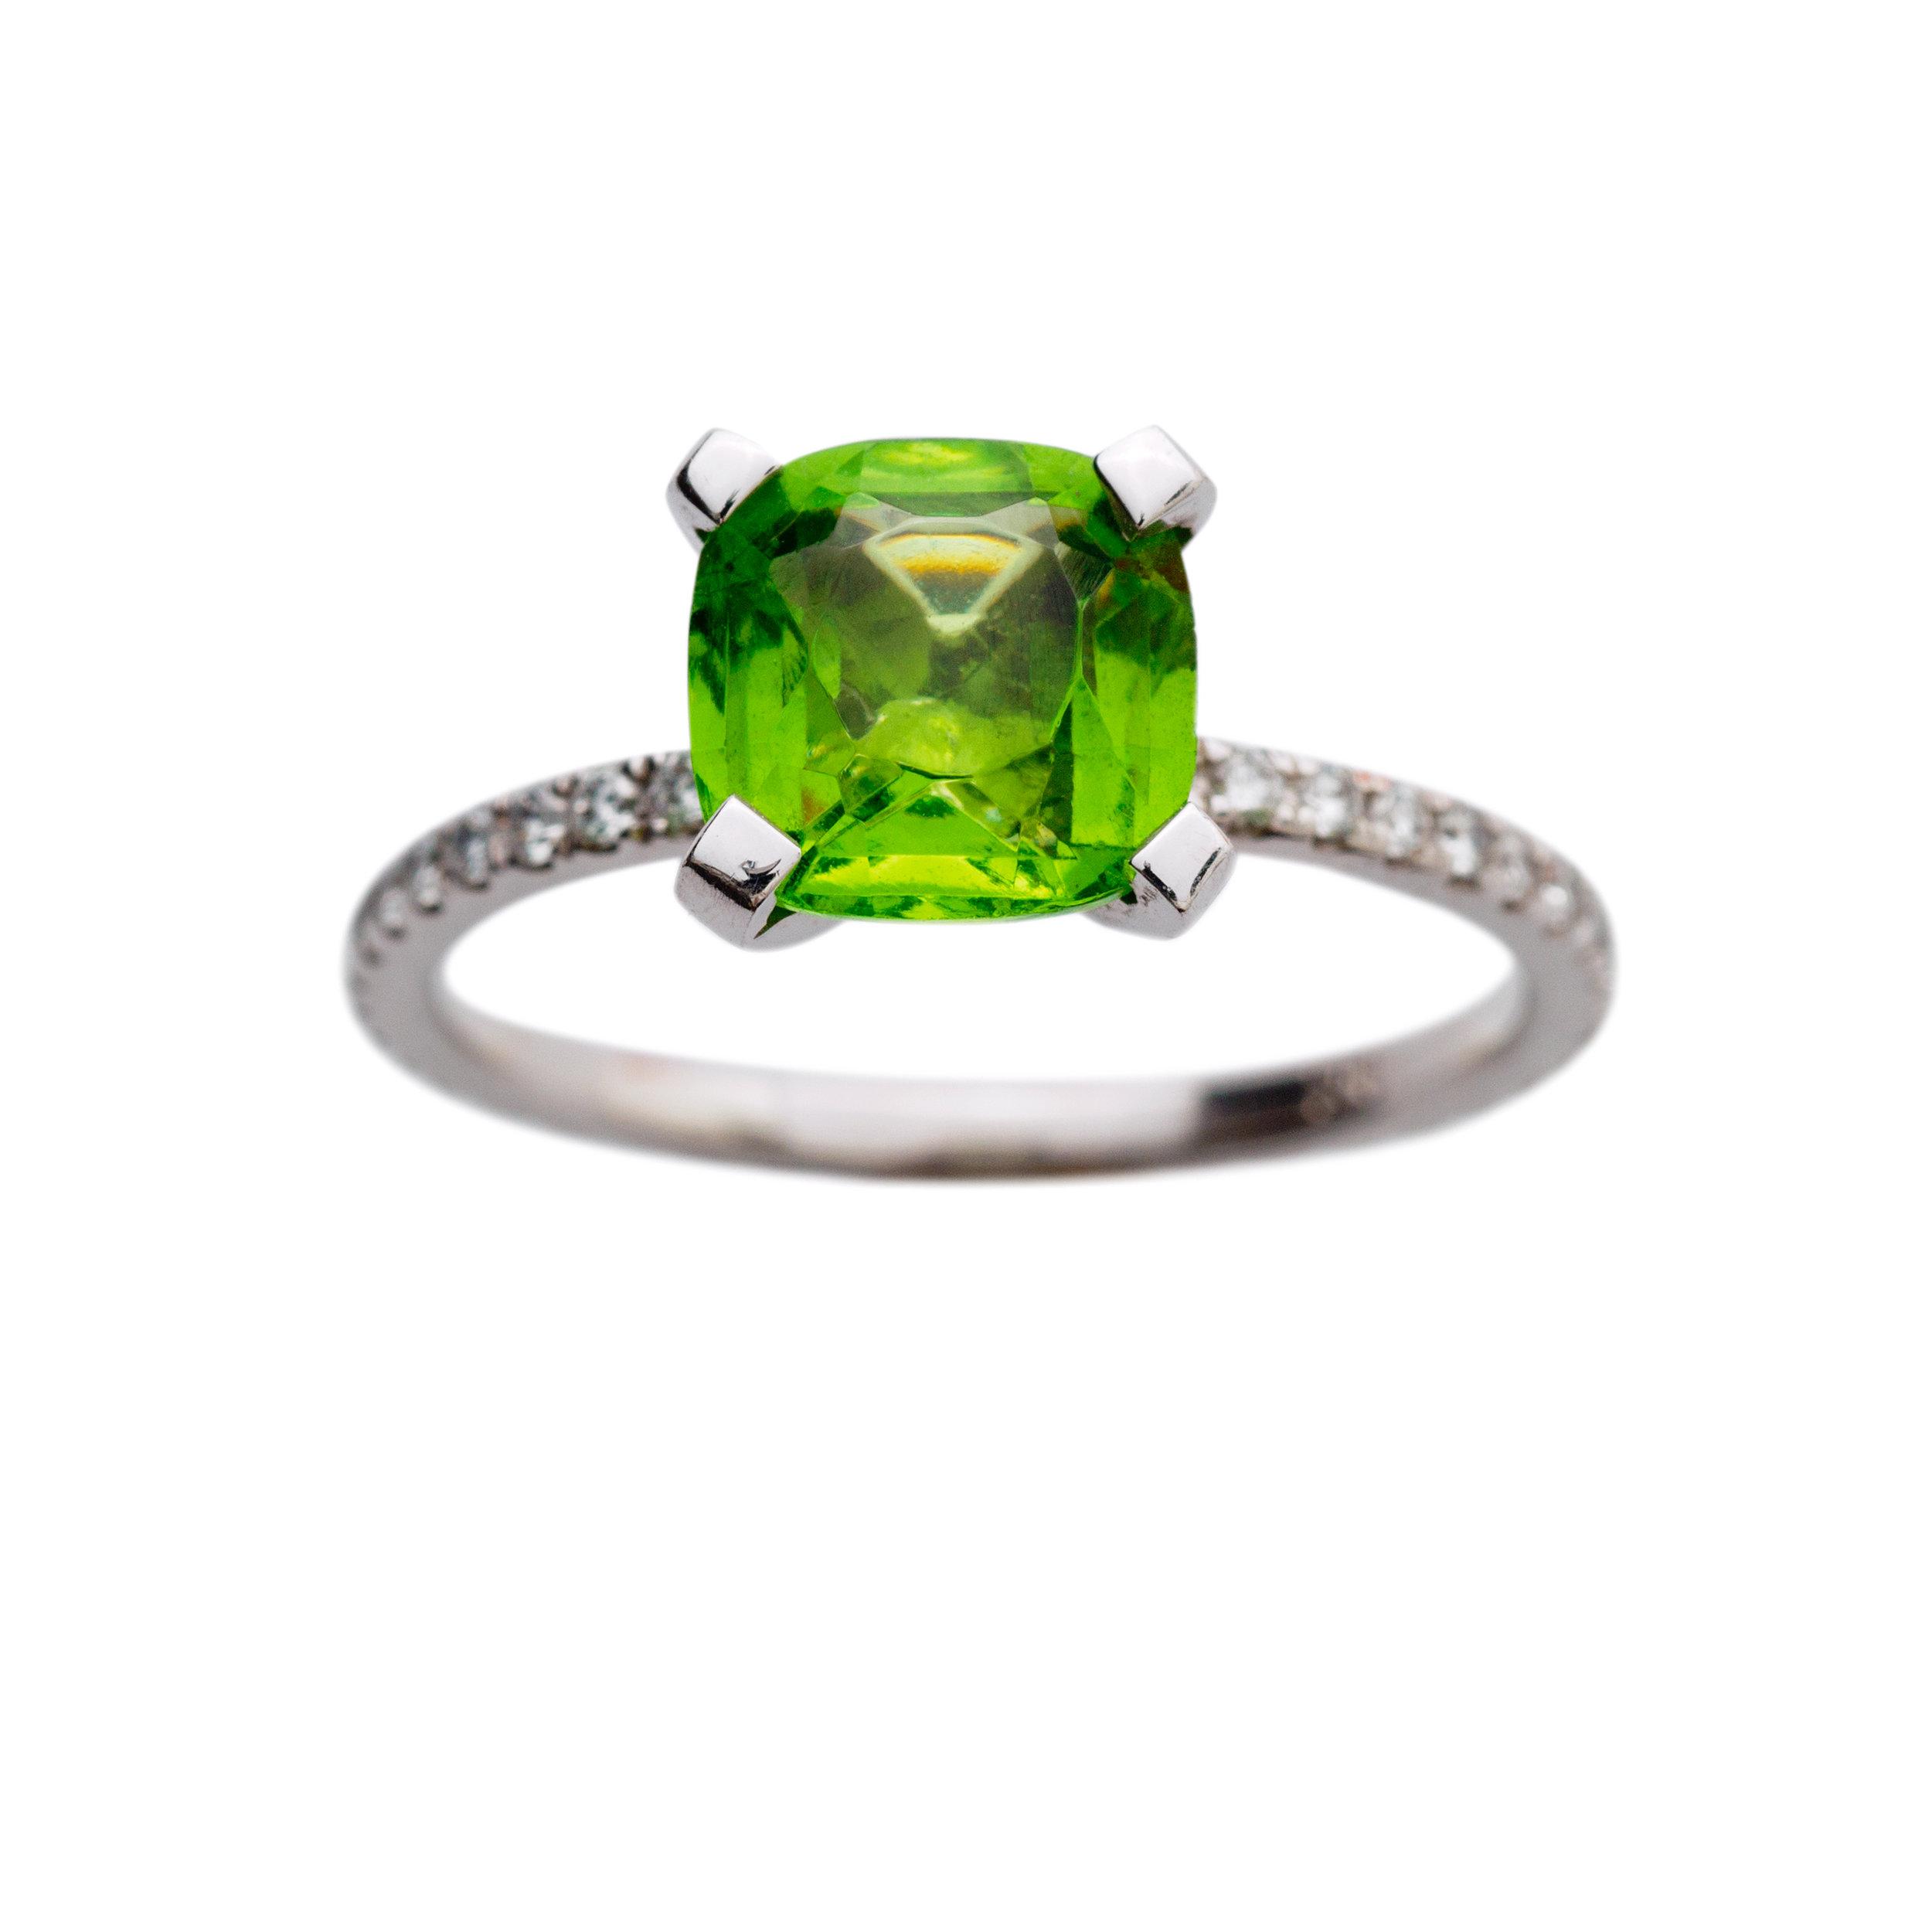 ST TROPEZ RING 22.500 NOK. 18 kt gold, diamonds and green turmaline